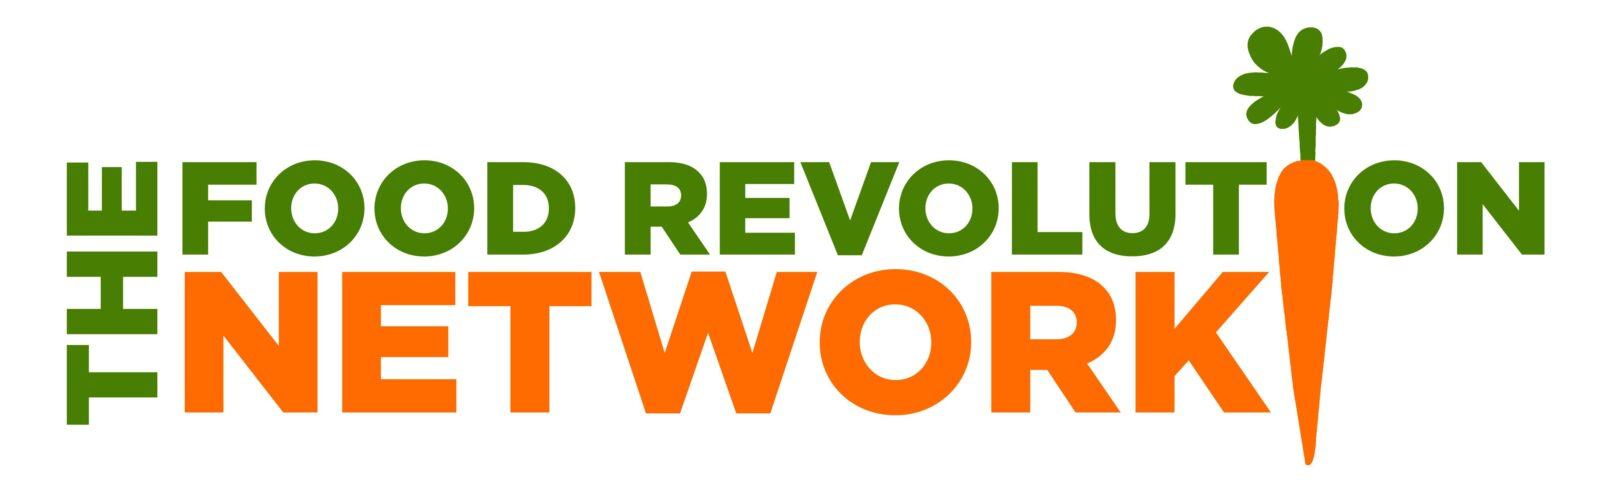 WFPB.ORG Alliance | Food Revolution Network